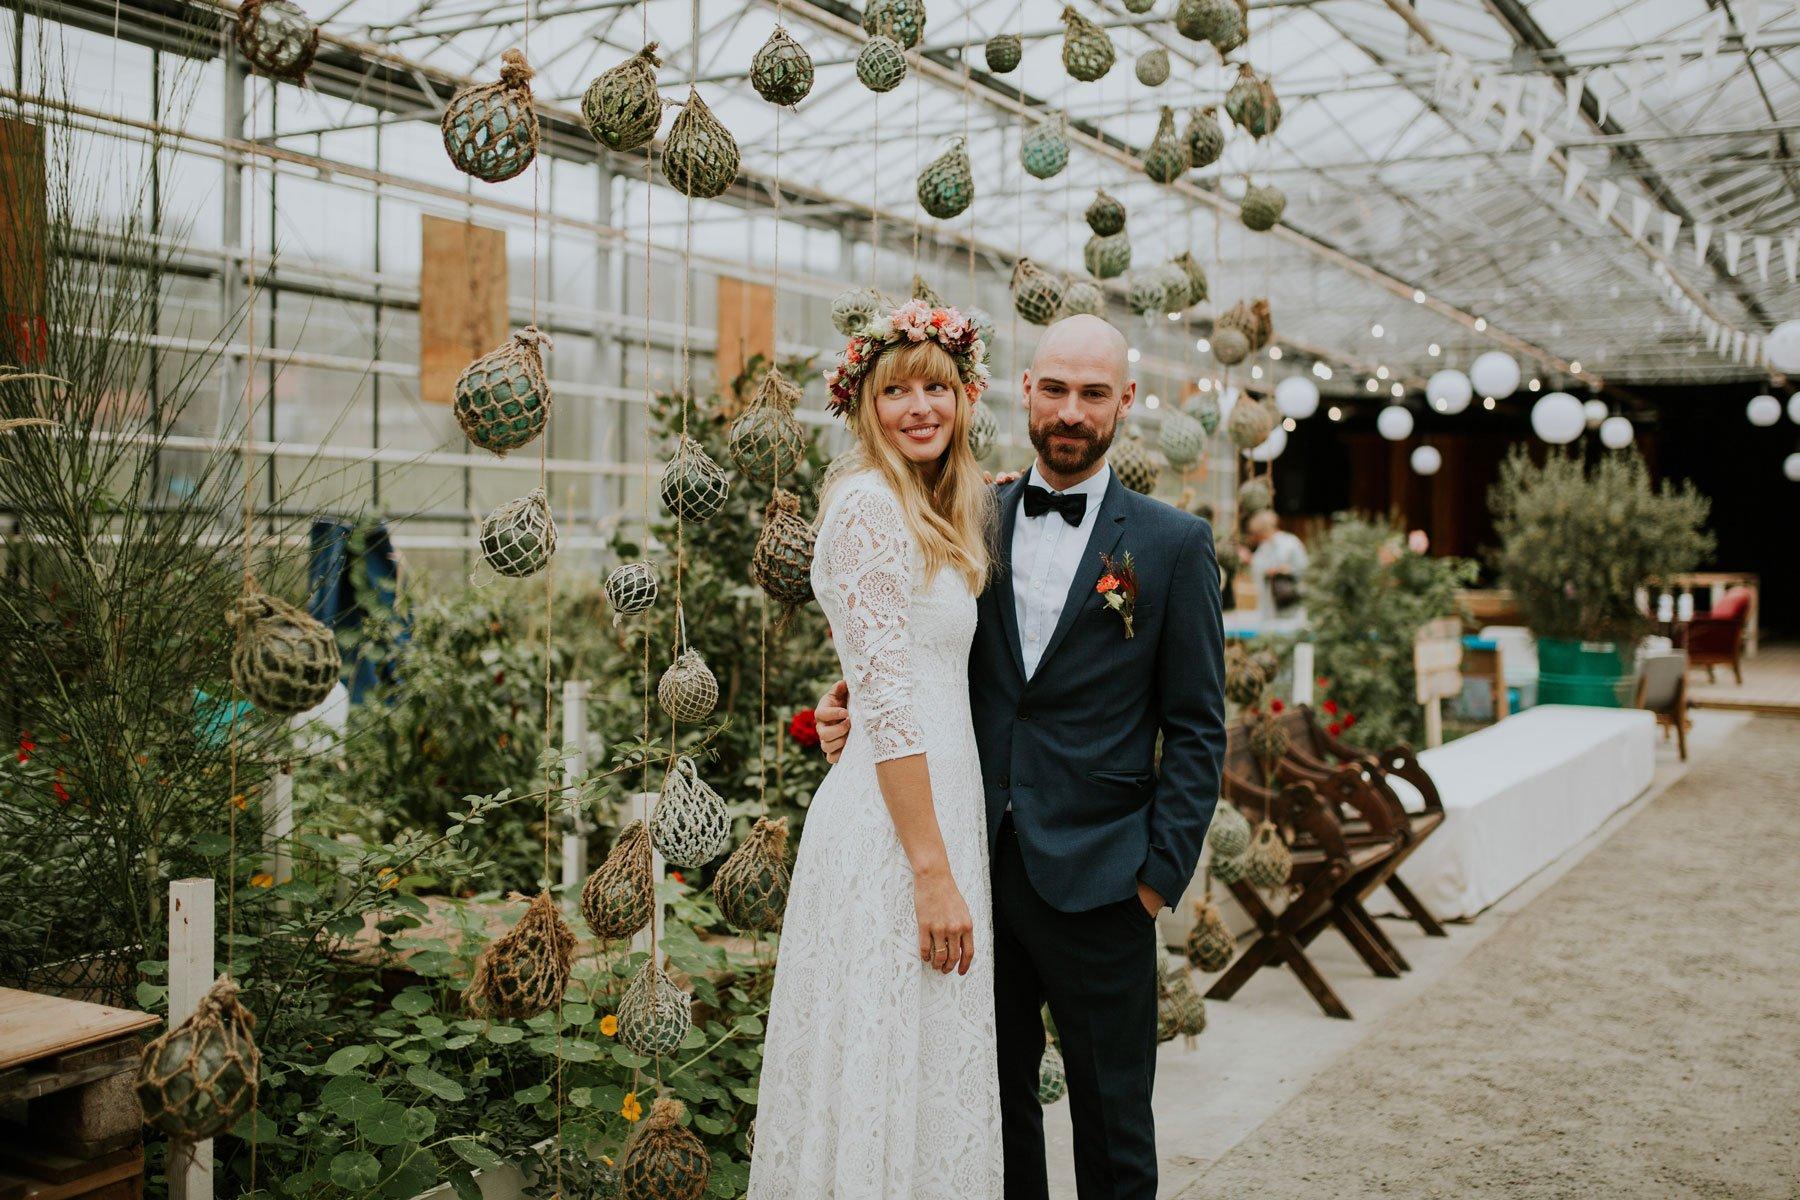 couple norwegian wedding lineowrenfotografi tuvamats